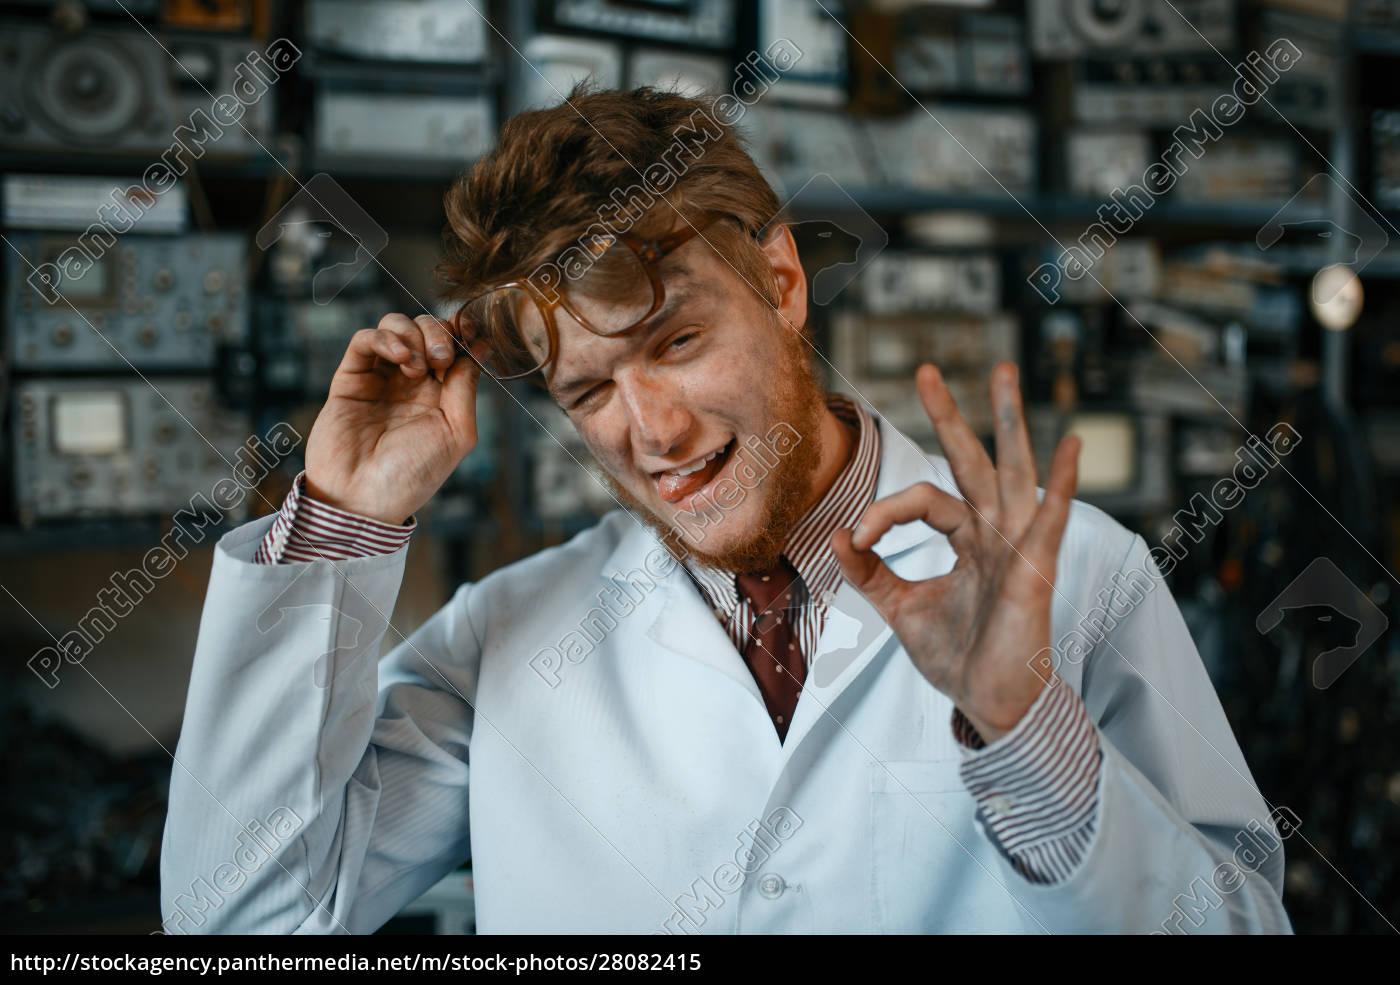 strange, male, scientist, shows, ok, sign - 28082415